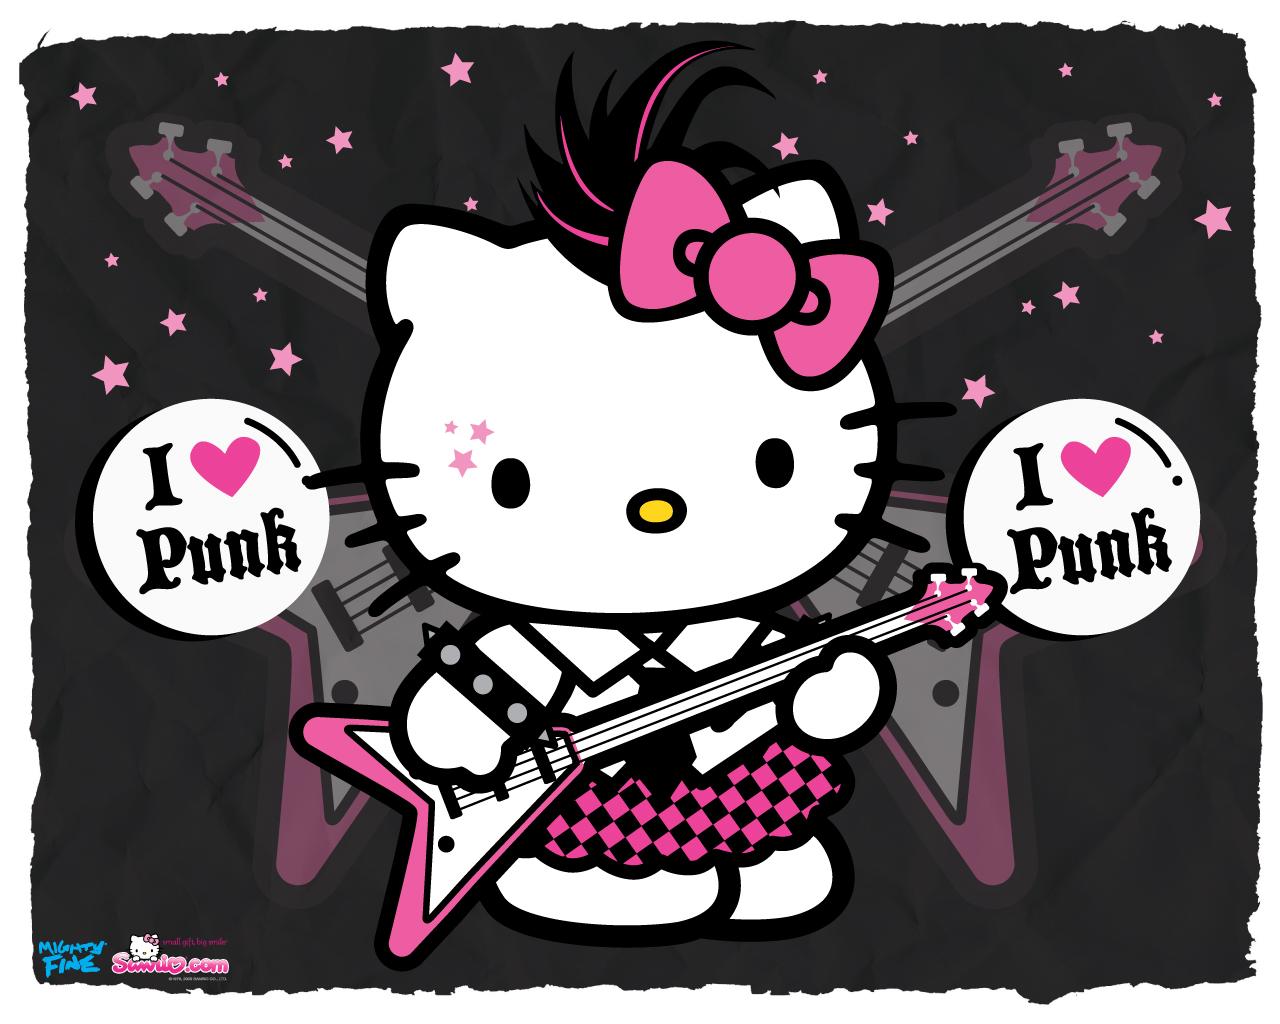 http://3.bp.blogspot.com/_7oRT3kuV9sI/S9jKZ54d6RI/AAAAAAAAAFE/6xRZjqiiGKg/s1600/hk_punk_wallpaper.jpg